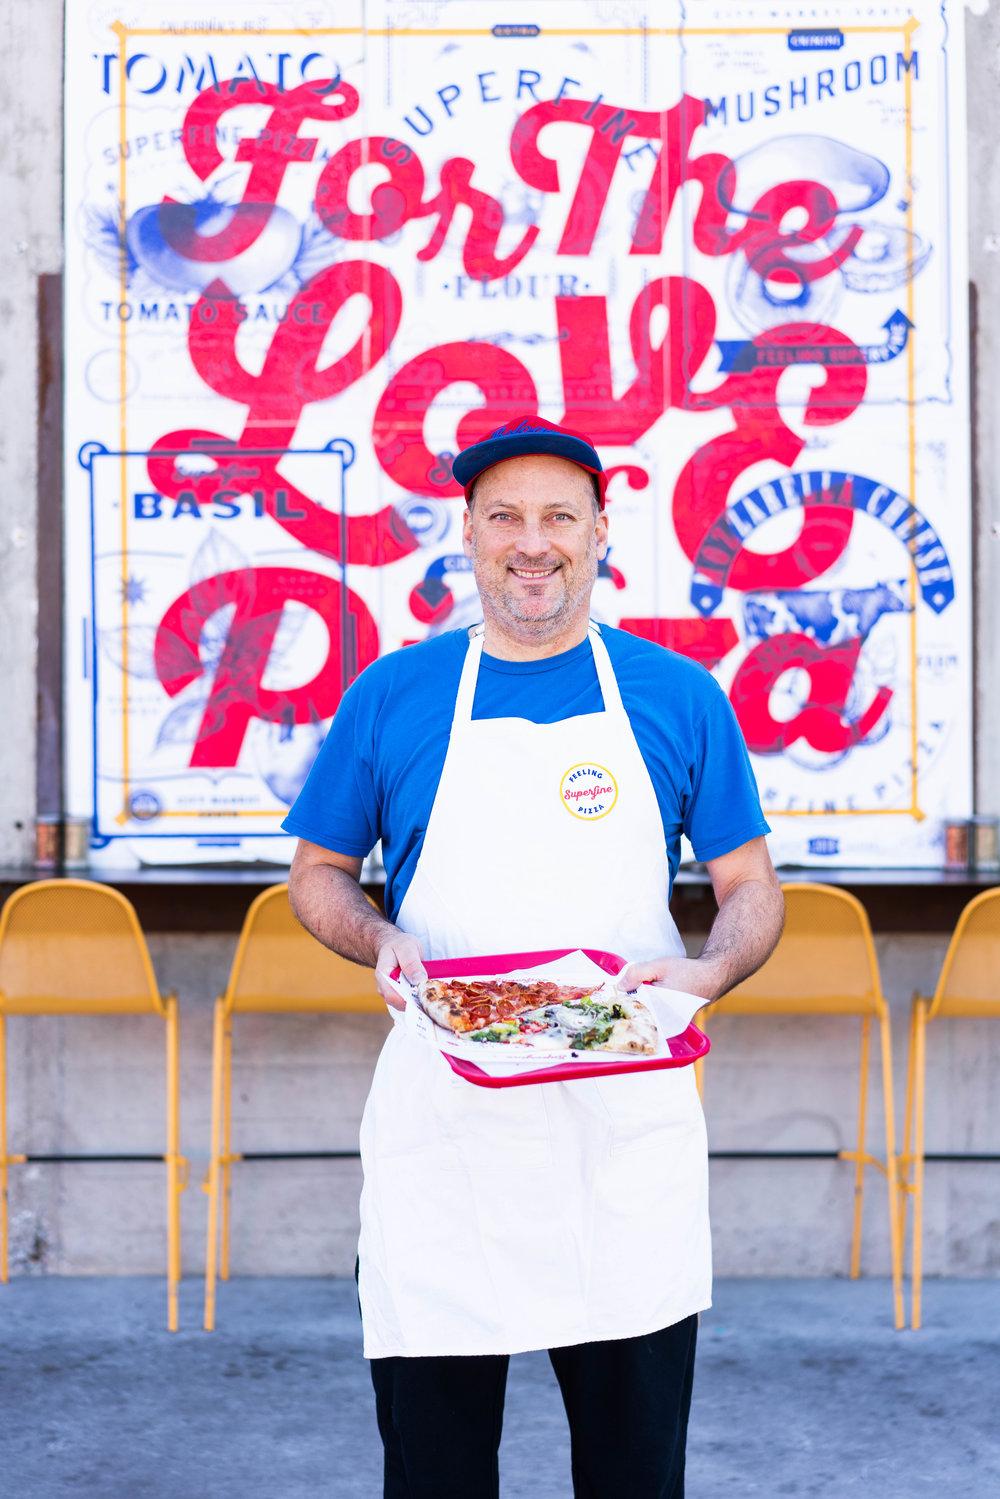 LA-Downtowner-Superfine-Pizza-3.jpg